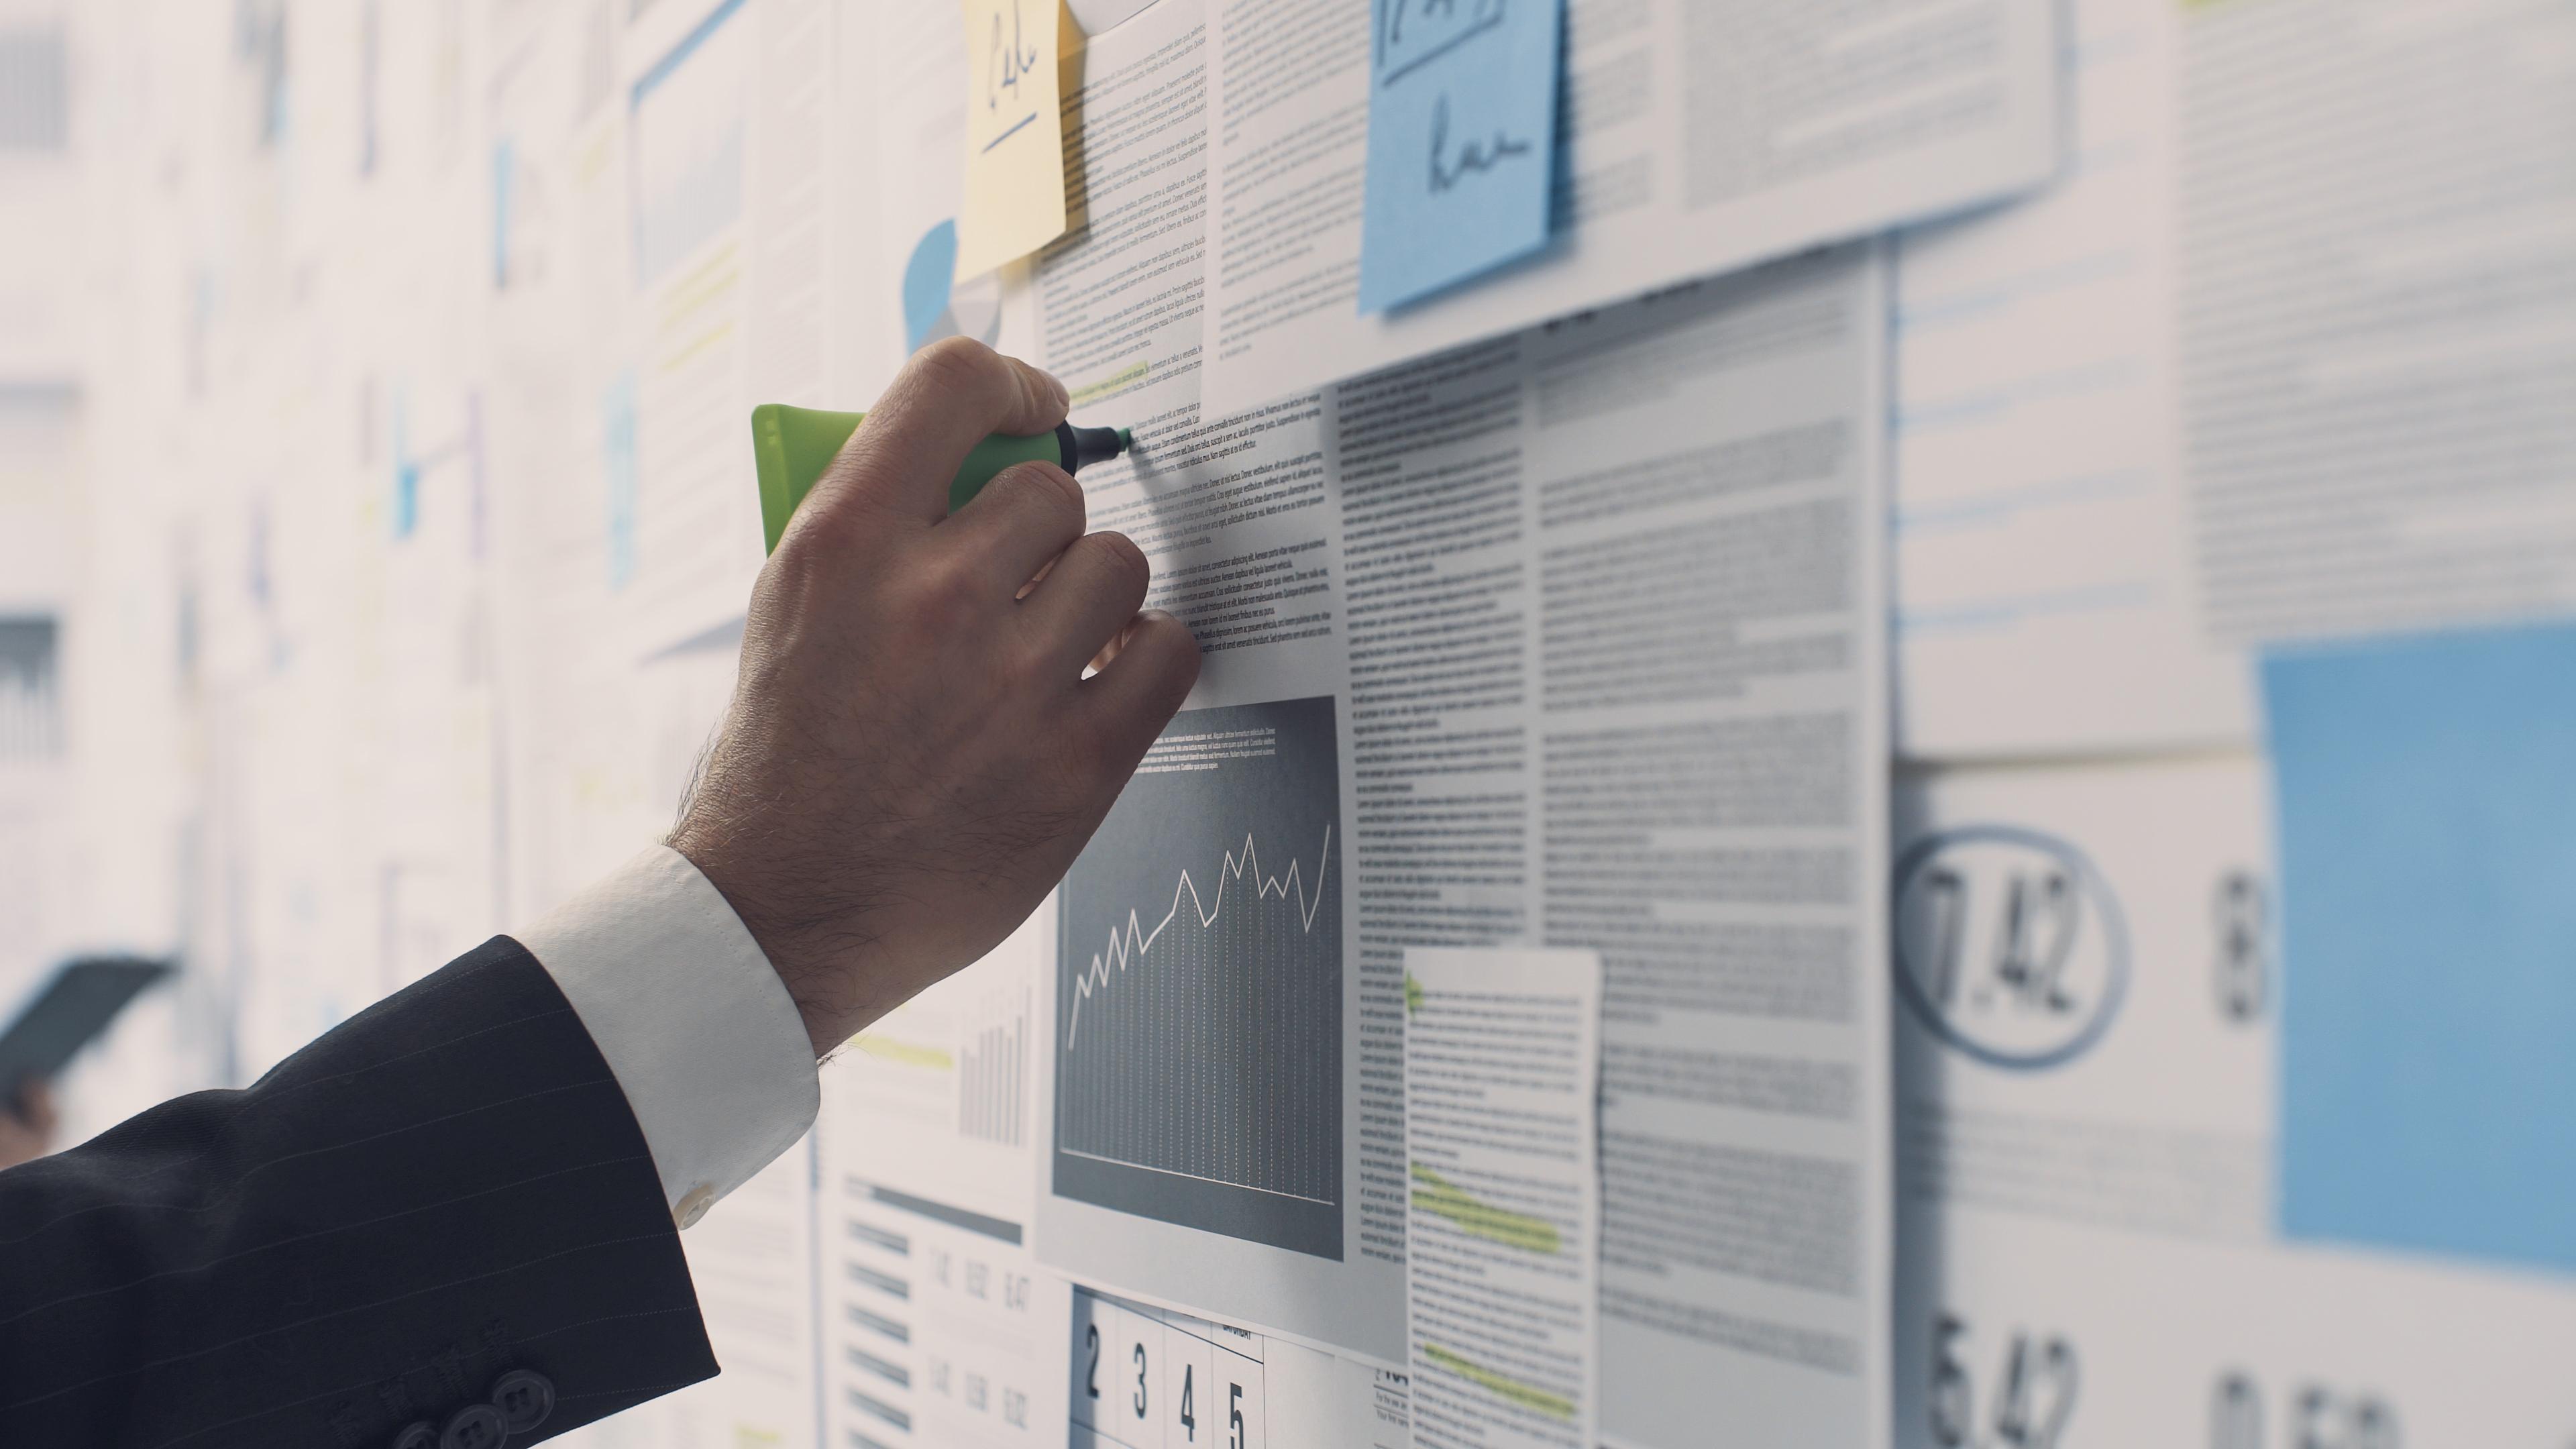 business man looking at charts and data